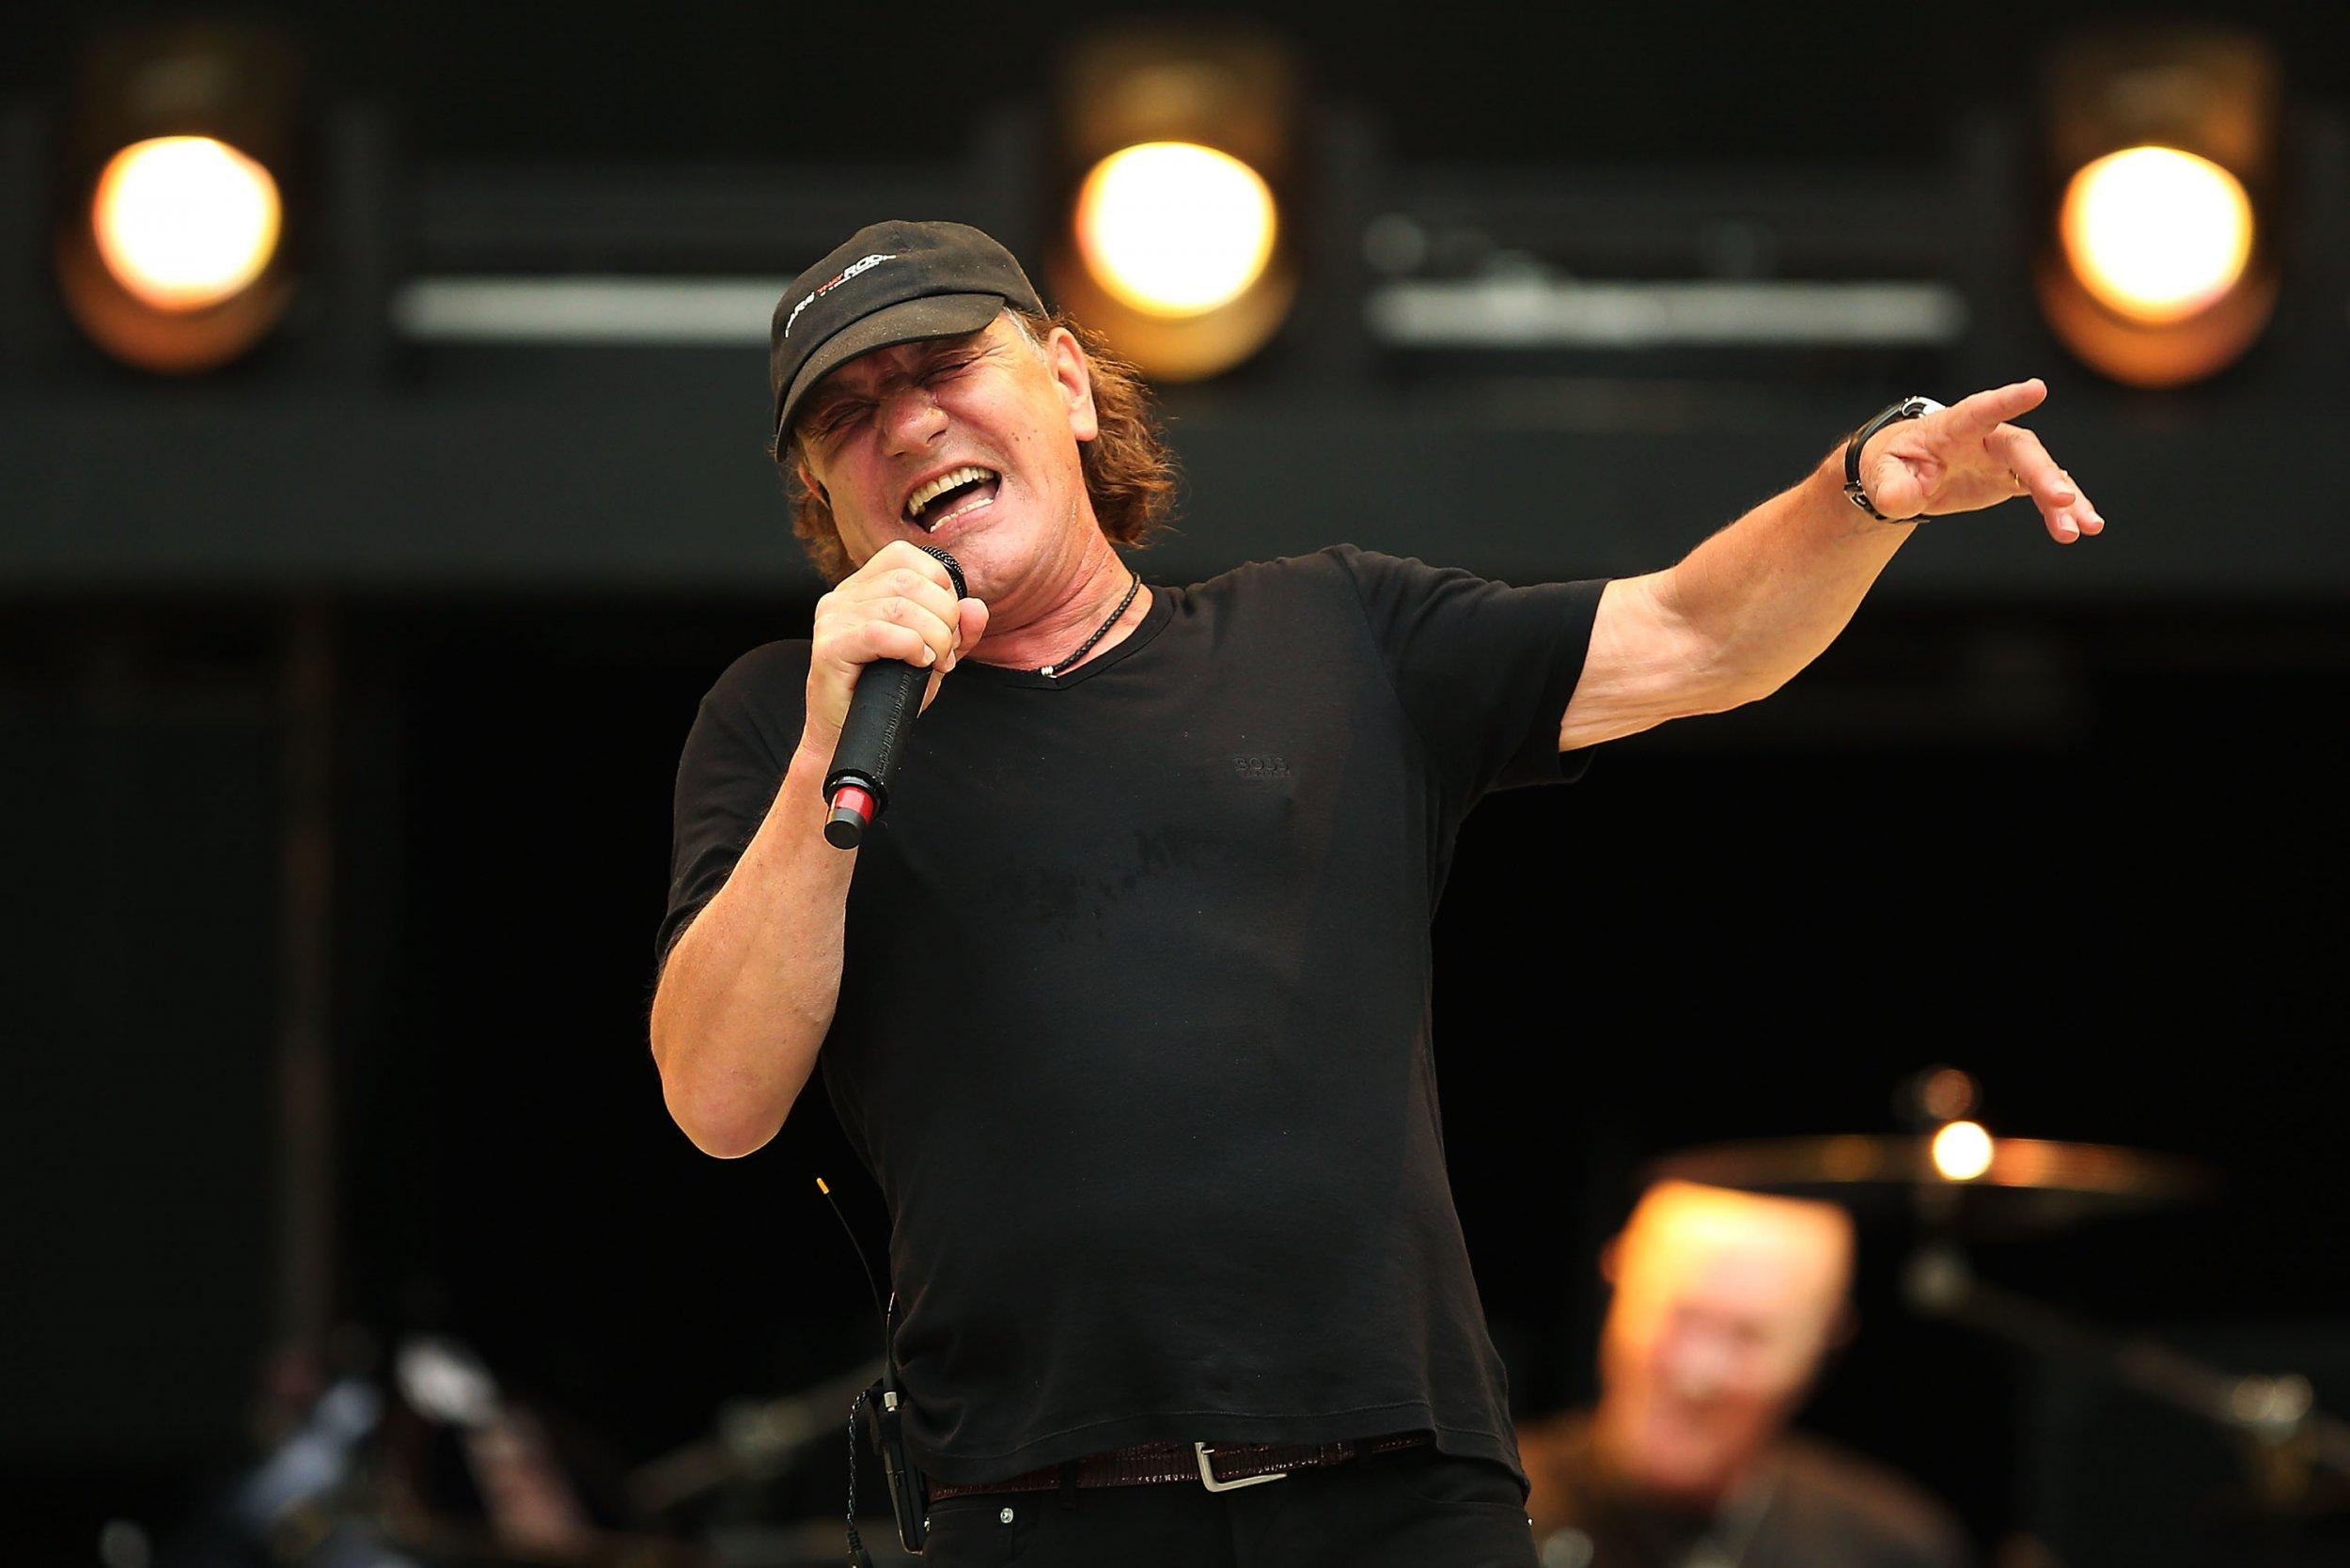 AC/DC's Brian Johnson performs